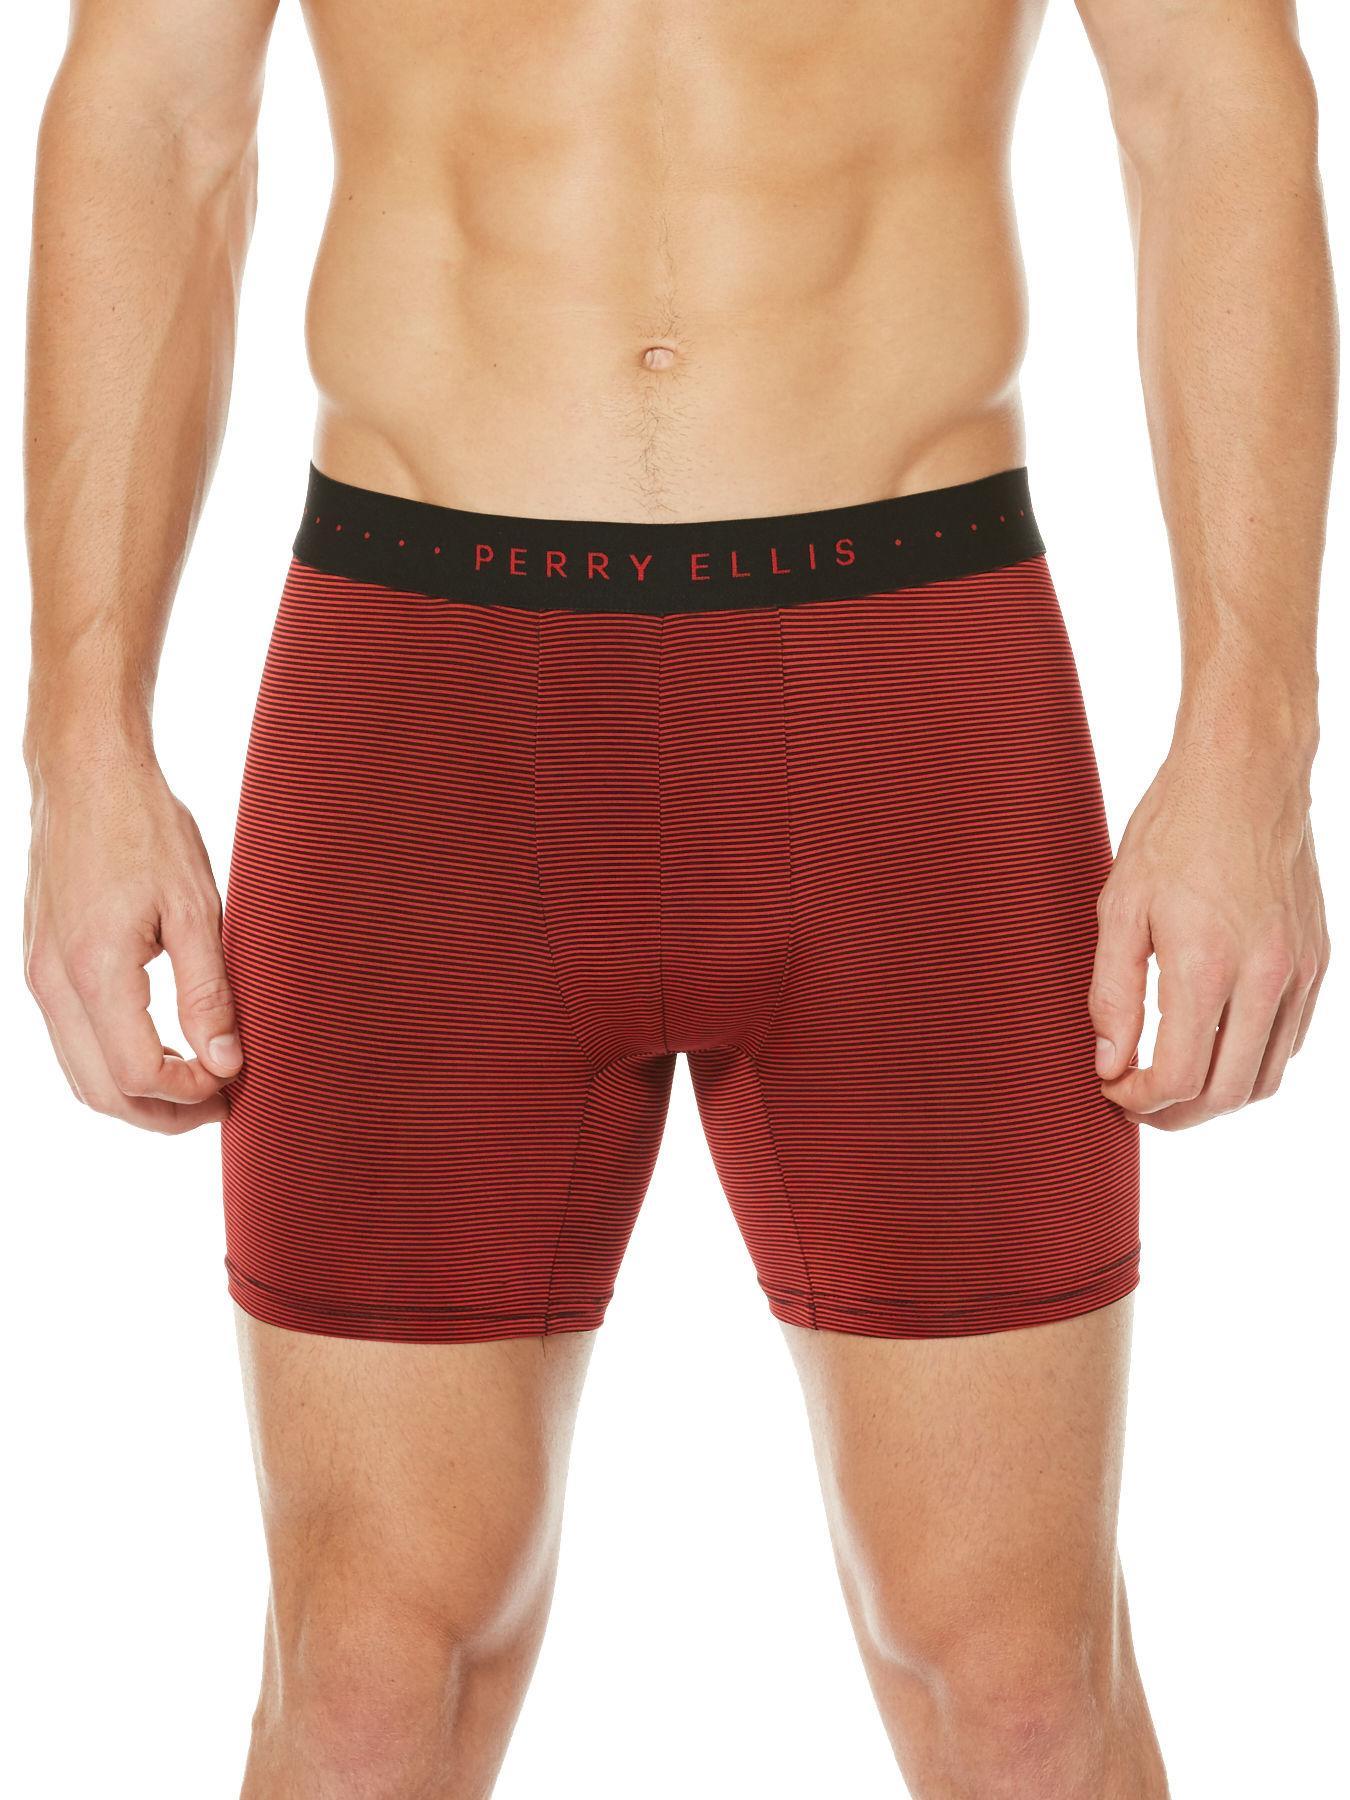 00b0962993c7fc Perry Ellis Mens Microfiber Luxe Paisley Boxer Short Boxer Shorts Clothing  & Accessories Underwear